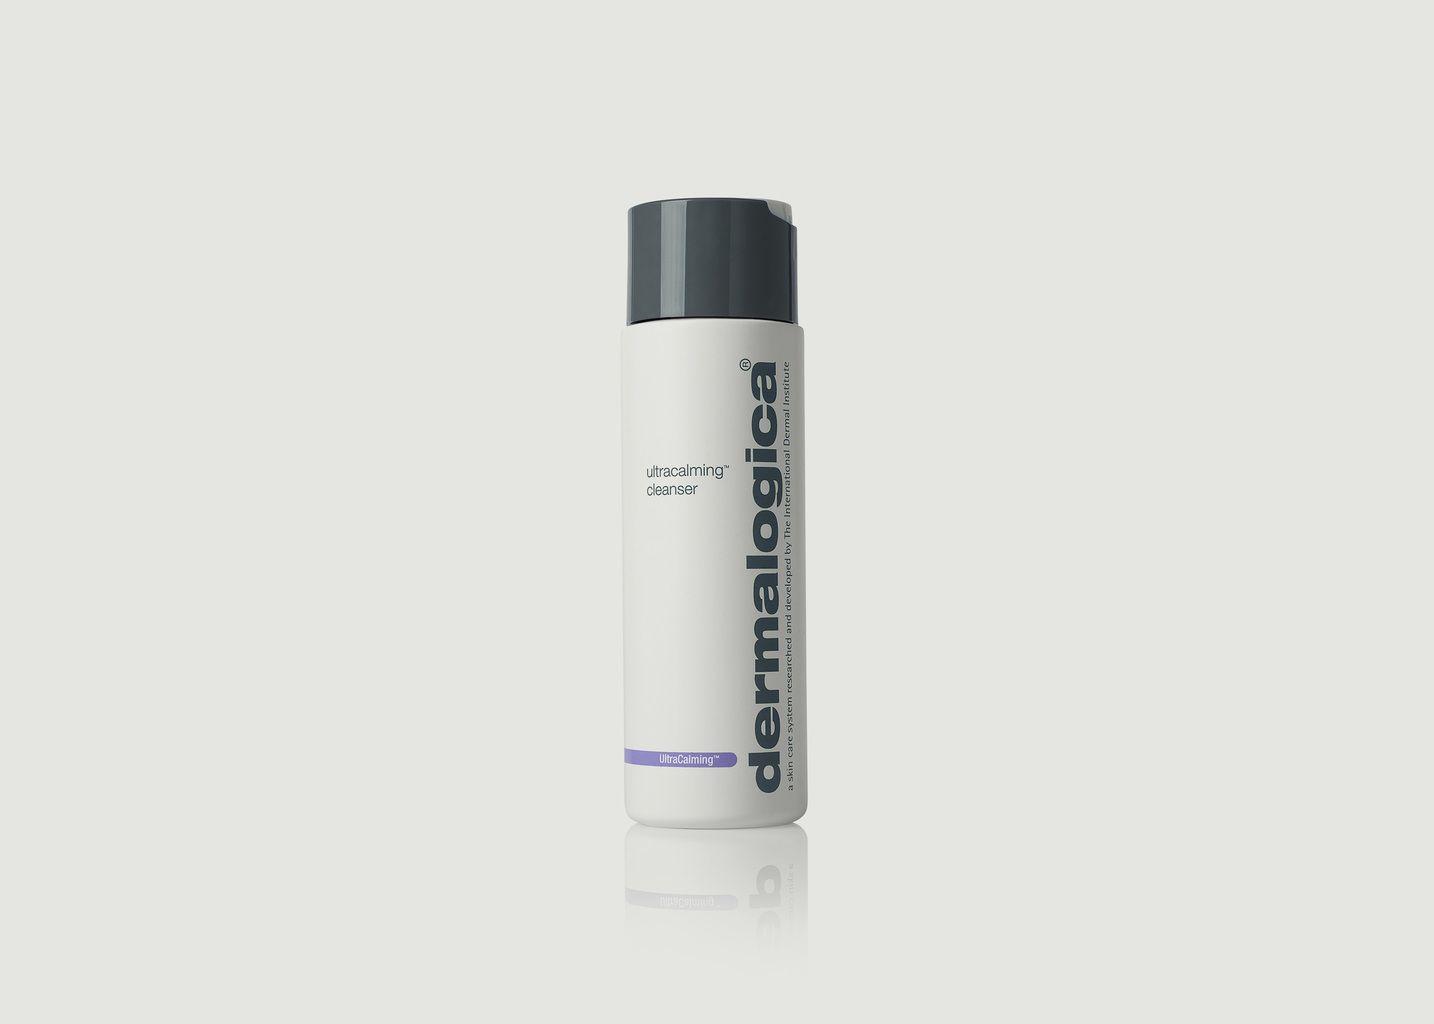 Ultracalming cleanser 250ml - Dermalogica